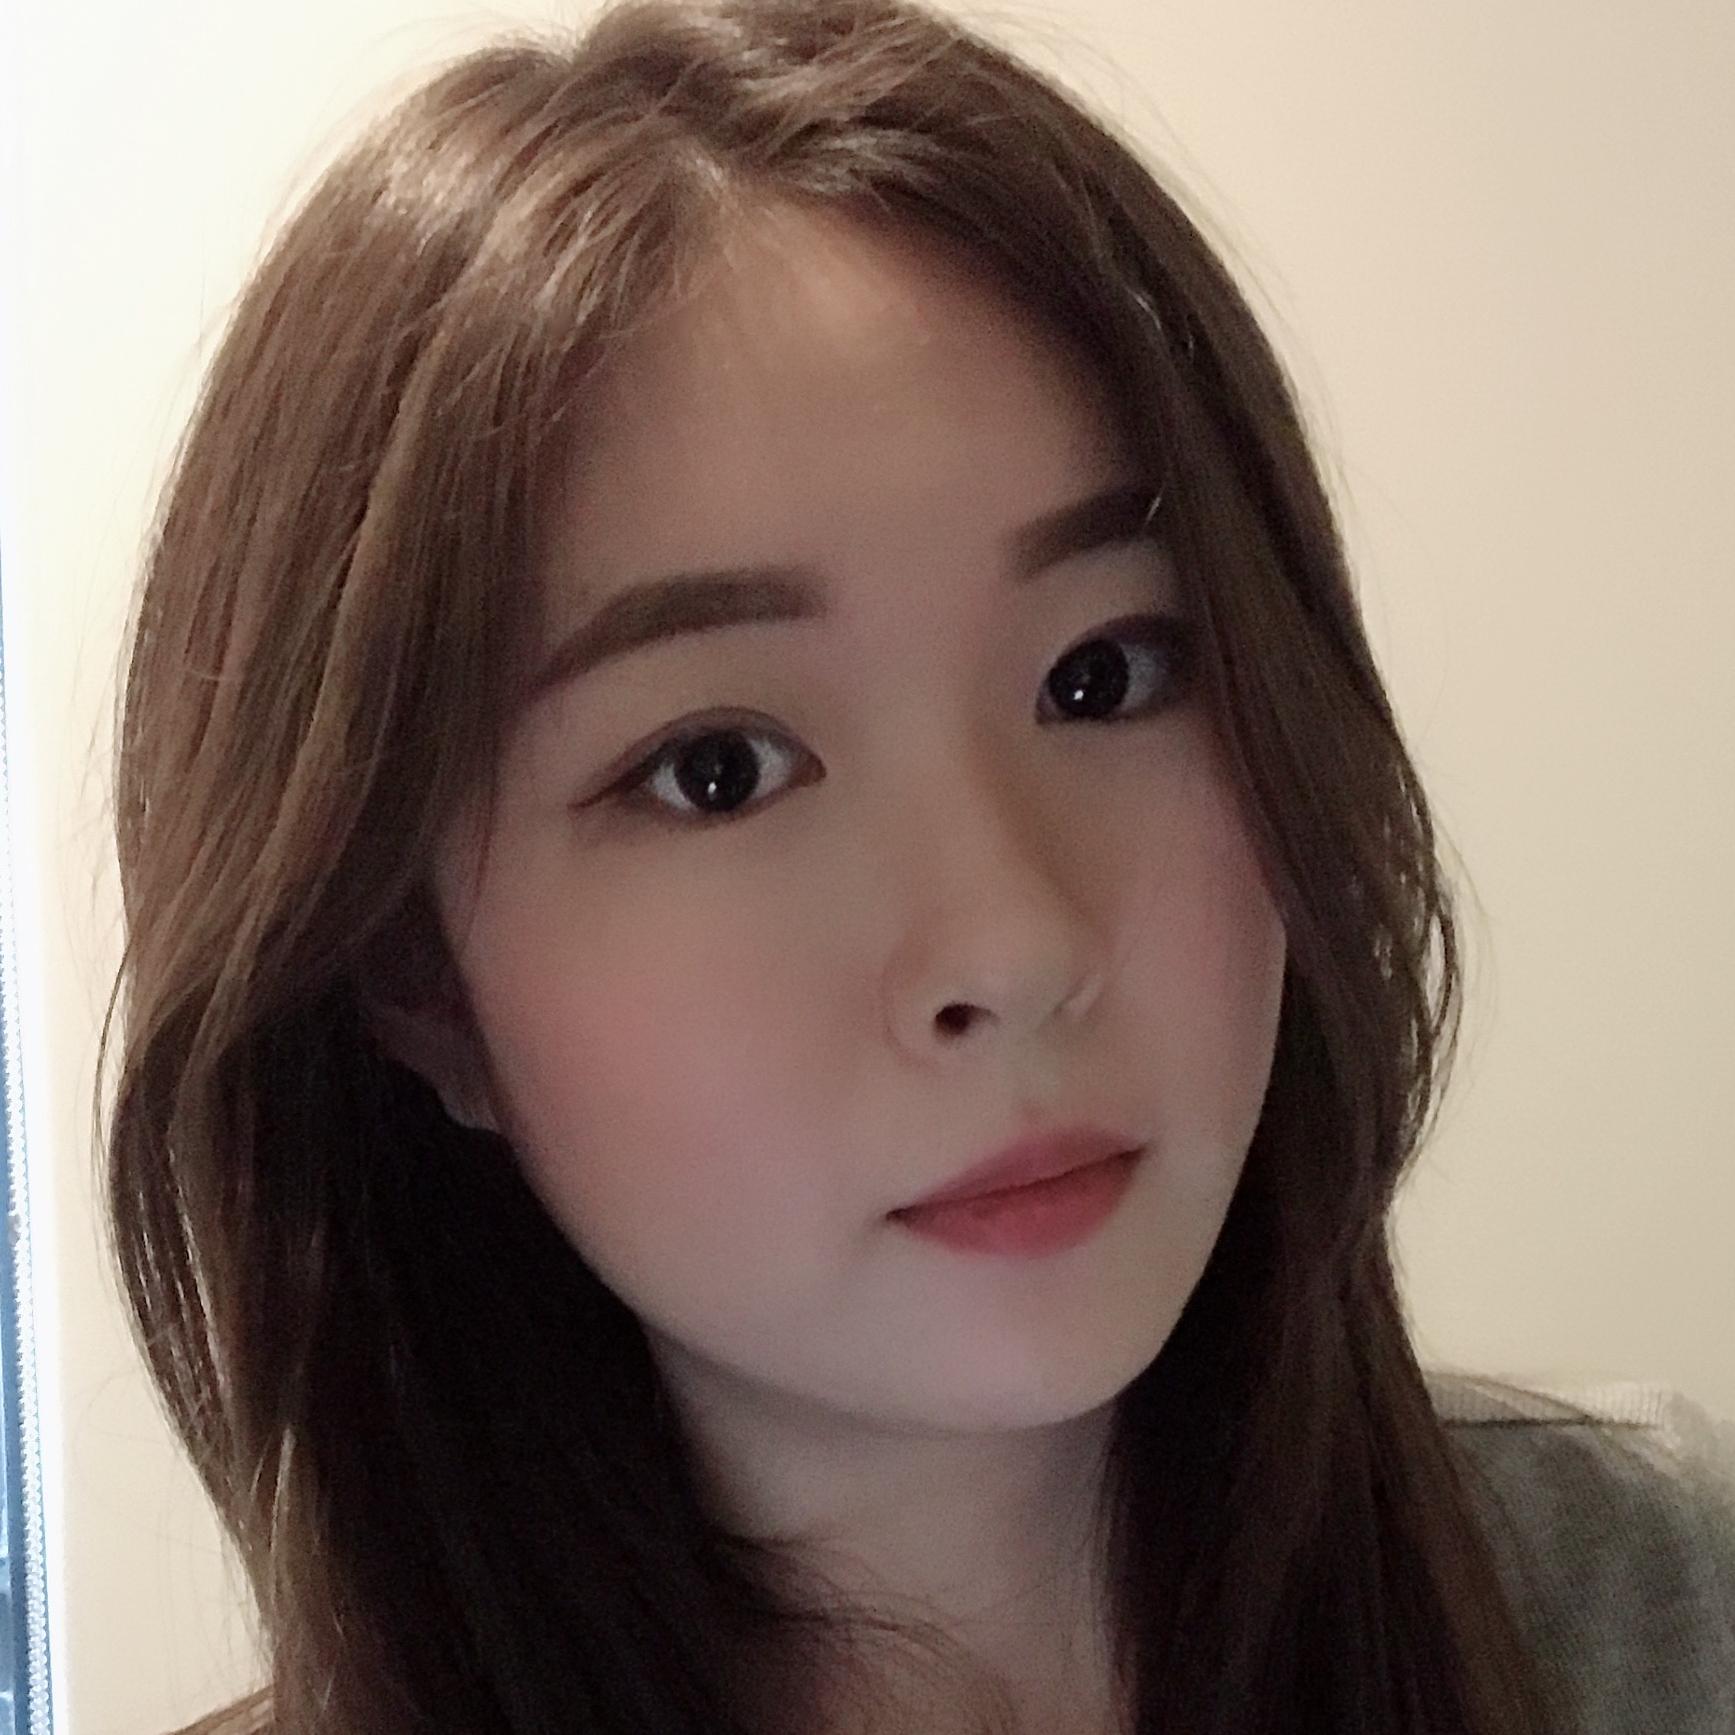 https://raw.githubusercontent.com/PurdueCAM2Project/HELPSweb/master/source/images/member_yukyung_lee.jpg